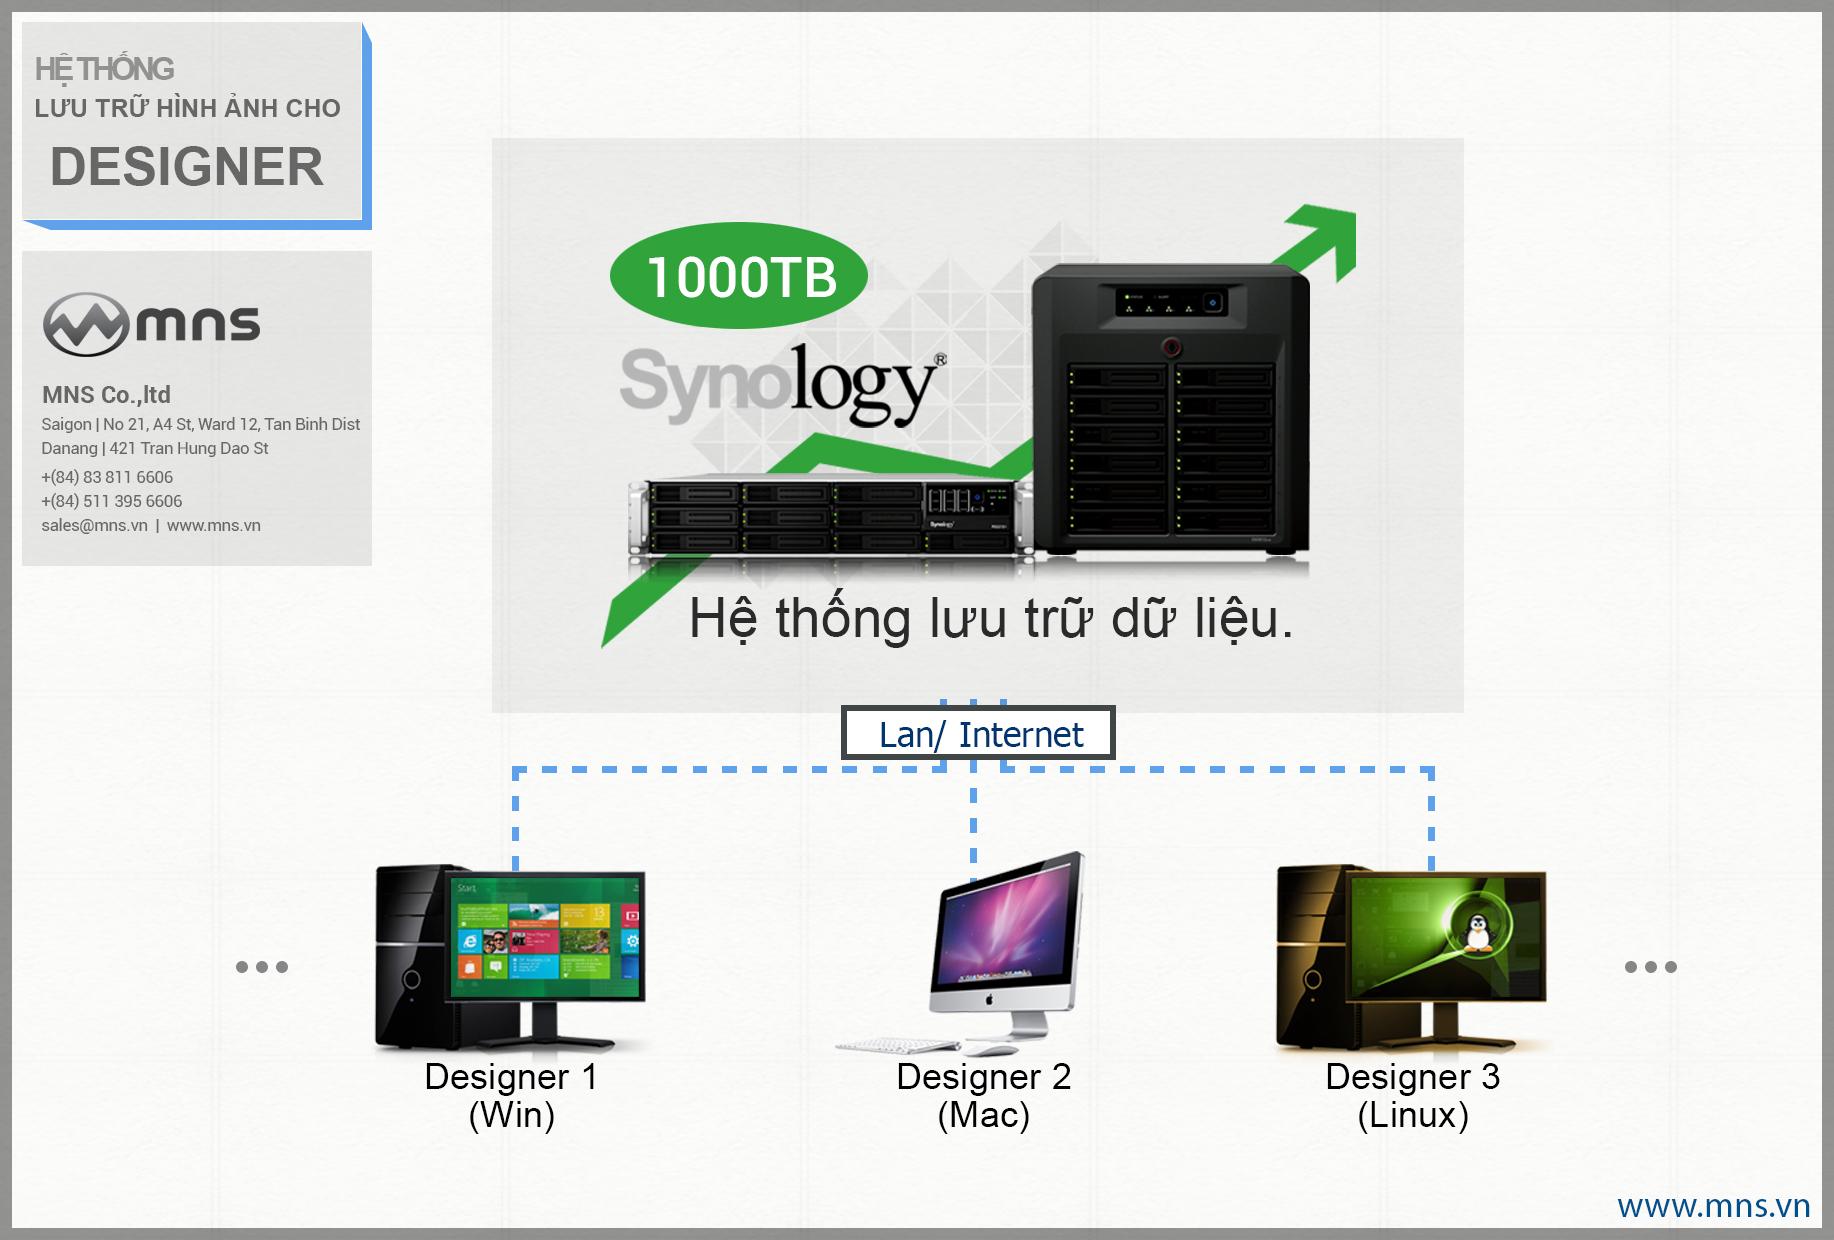 2-giai-phap-luu-tru-hinh-anh-photo-an-toan-chuyen-nghiep-studio-nhiep-anh-thuong-mai-design-thiet-ke-in-an-mns-nas-synology-server-website-blog-portfolio